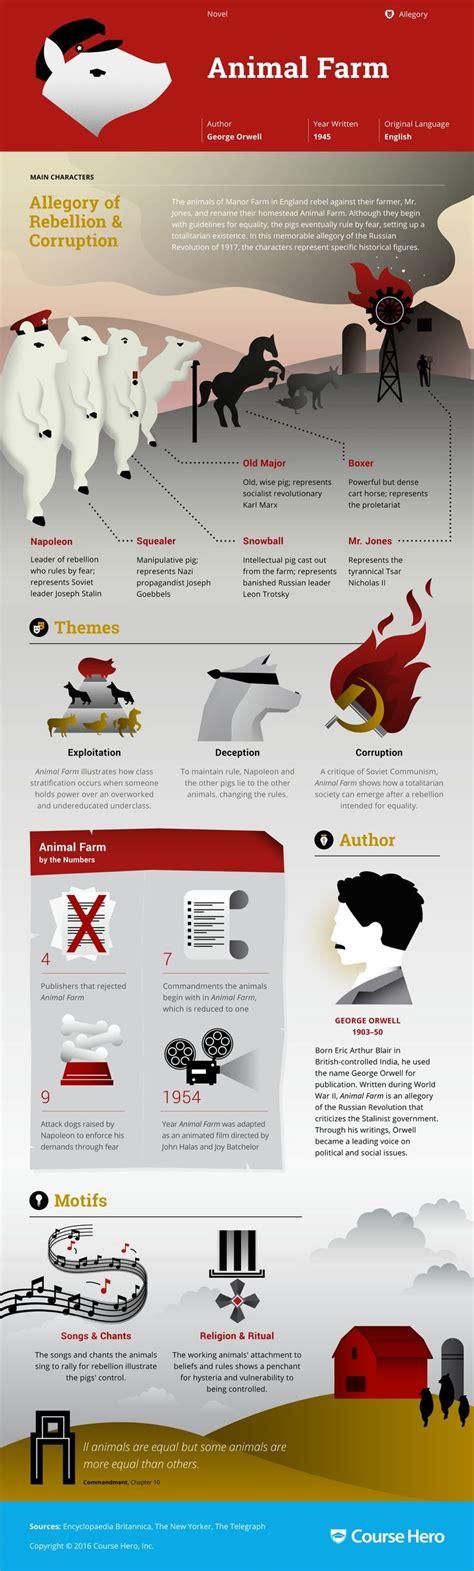 english drama themes best 25 english literature ideas on pinterest